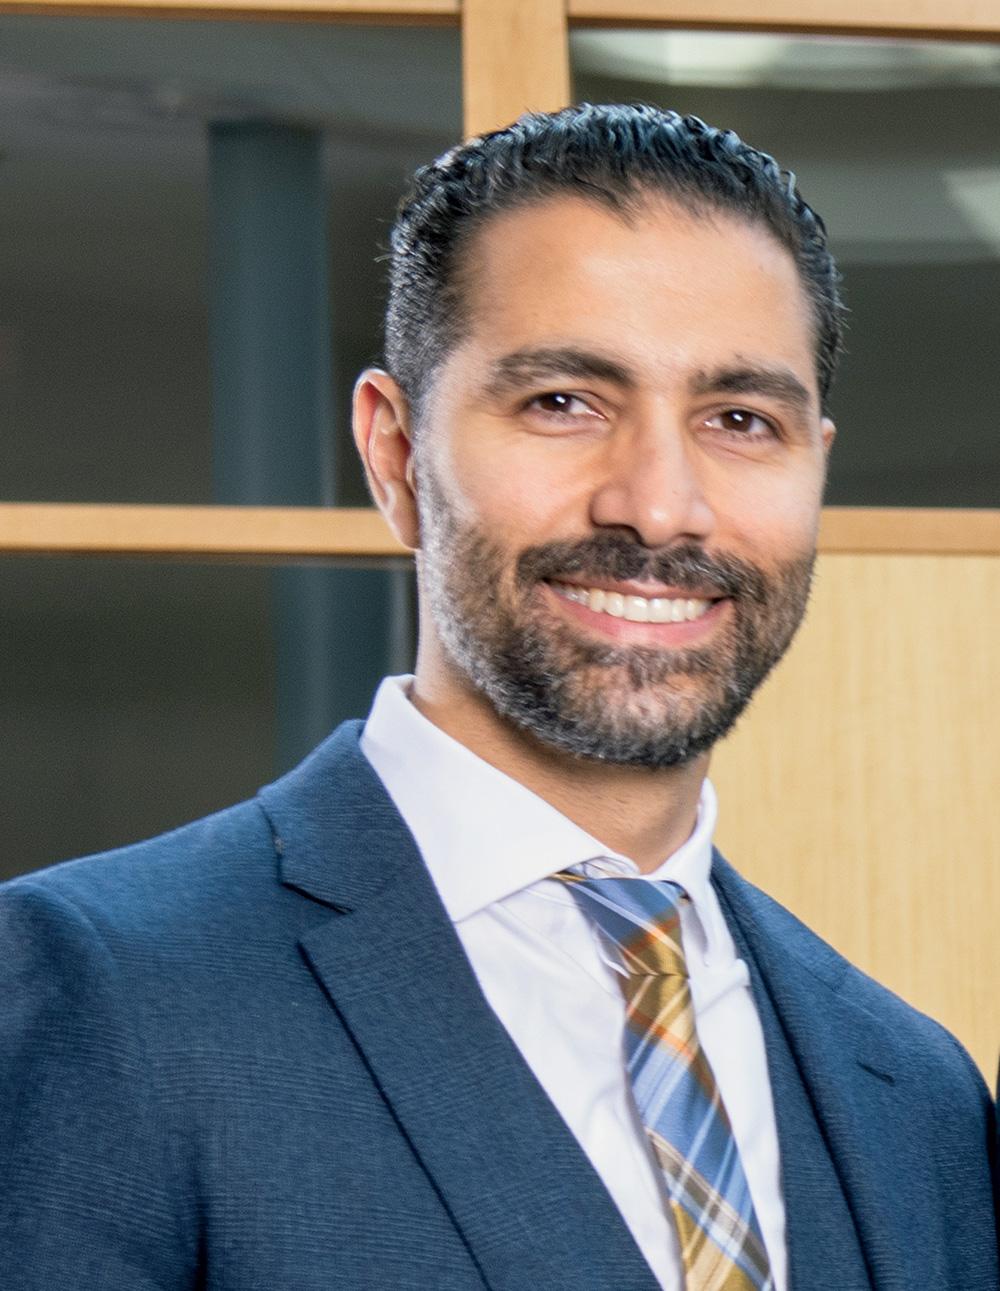 Amjad Nasr Anaizi